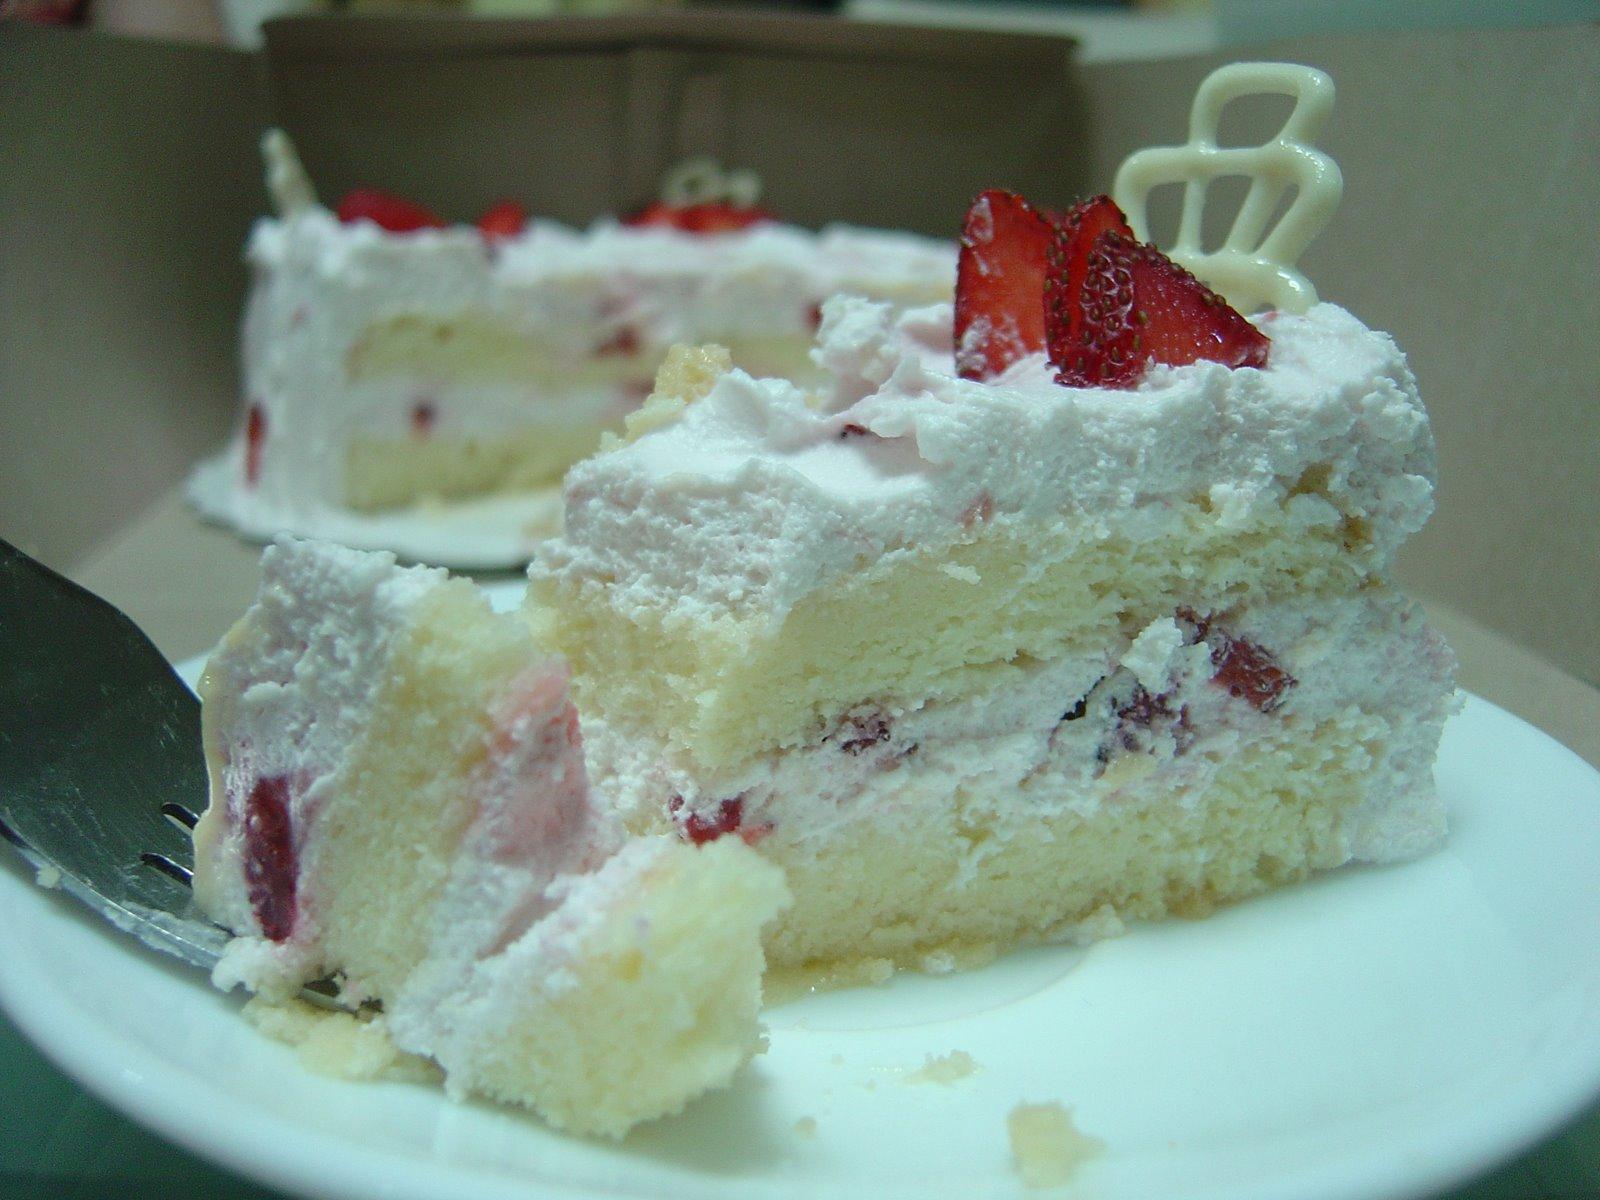 [Strawberry+petals2.JPG]